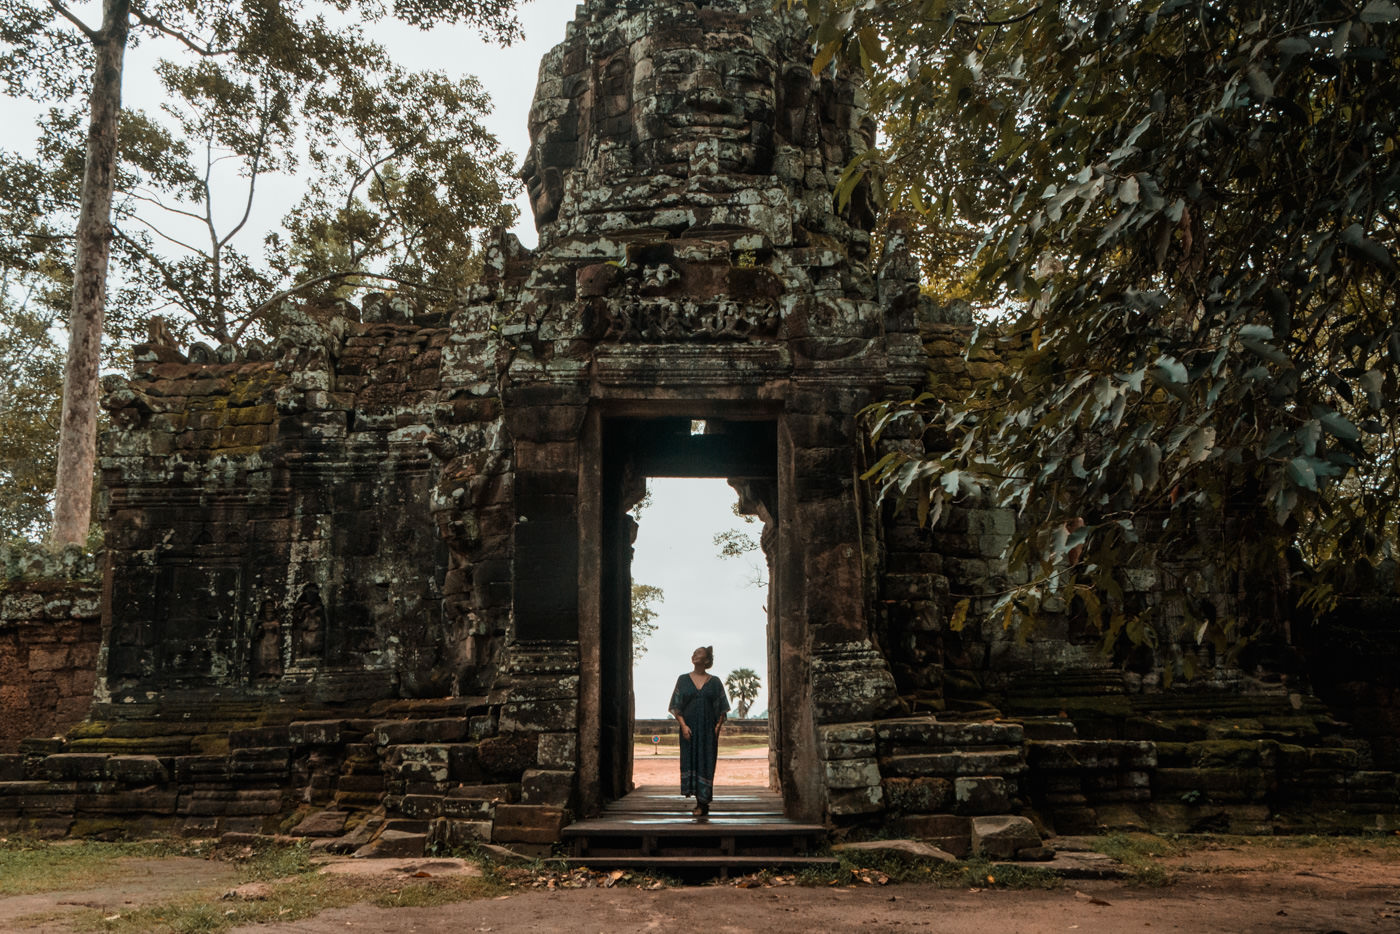 Eingang Banteay Kdei, Angkor Wat, Kambodscha